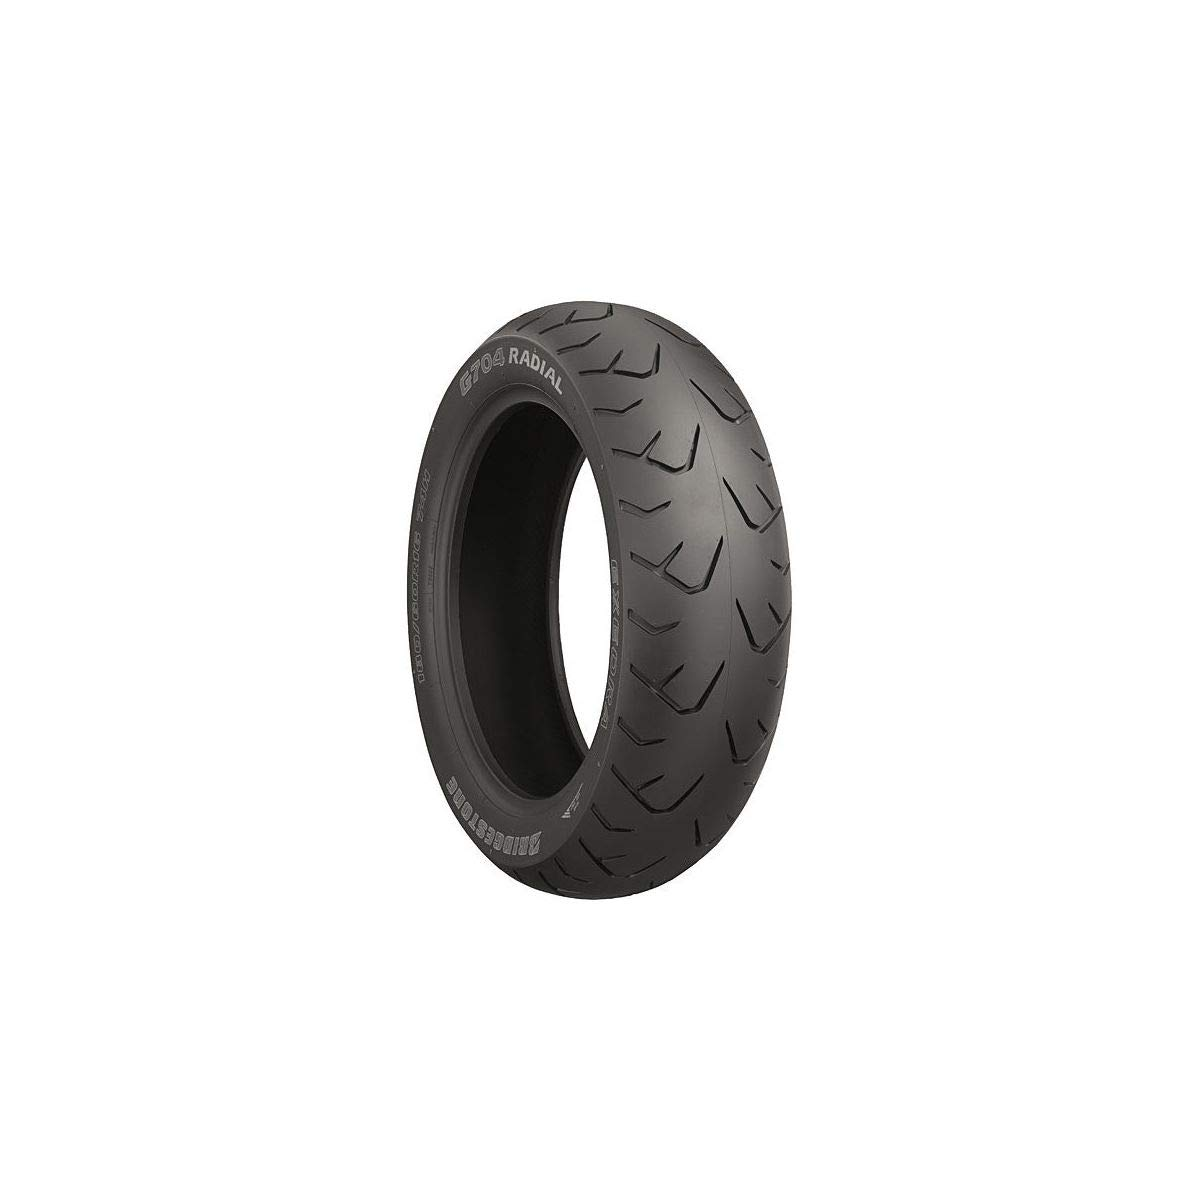 BRIDGESTONE Tire Exedra G704 180/60R16 Blackwall